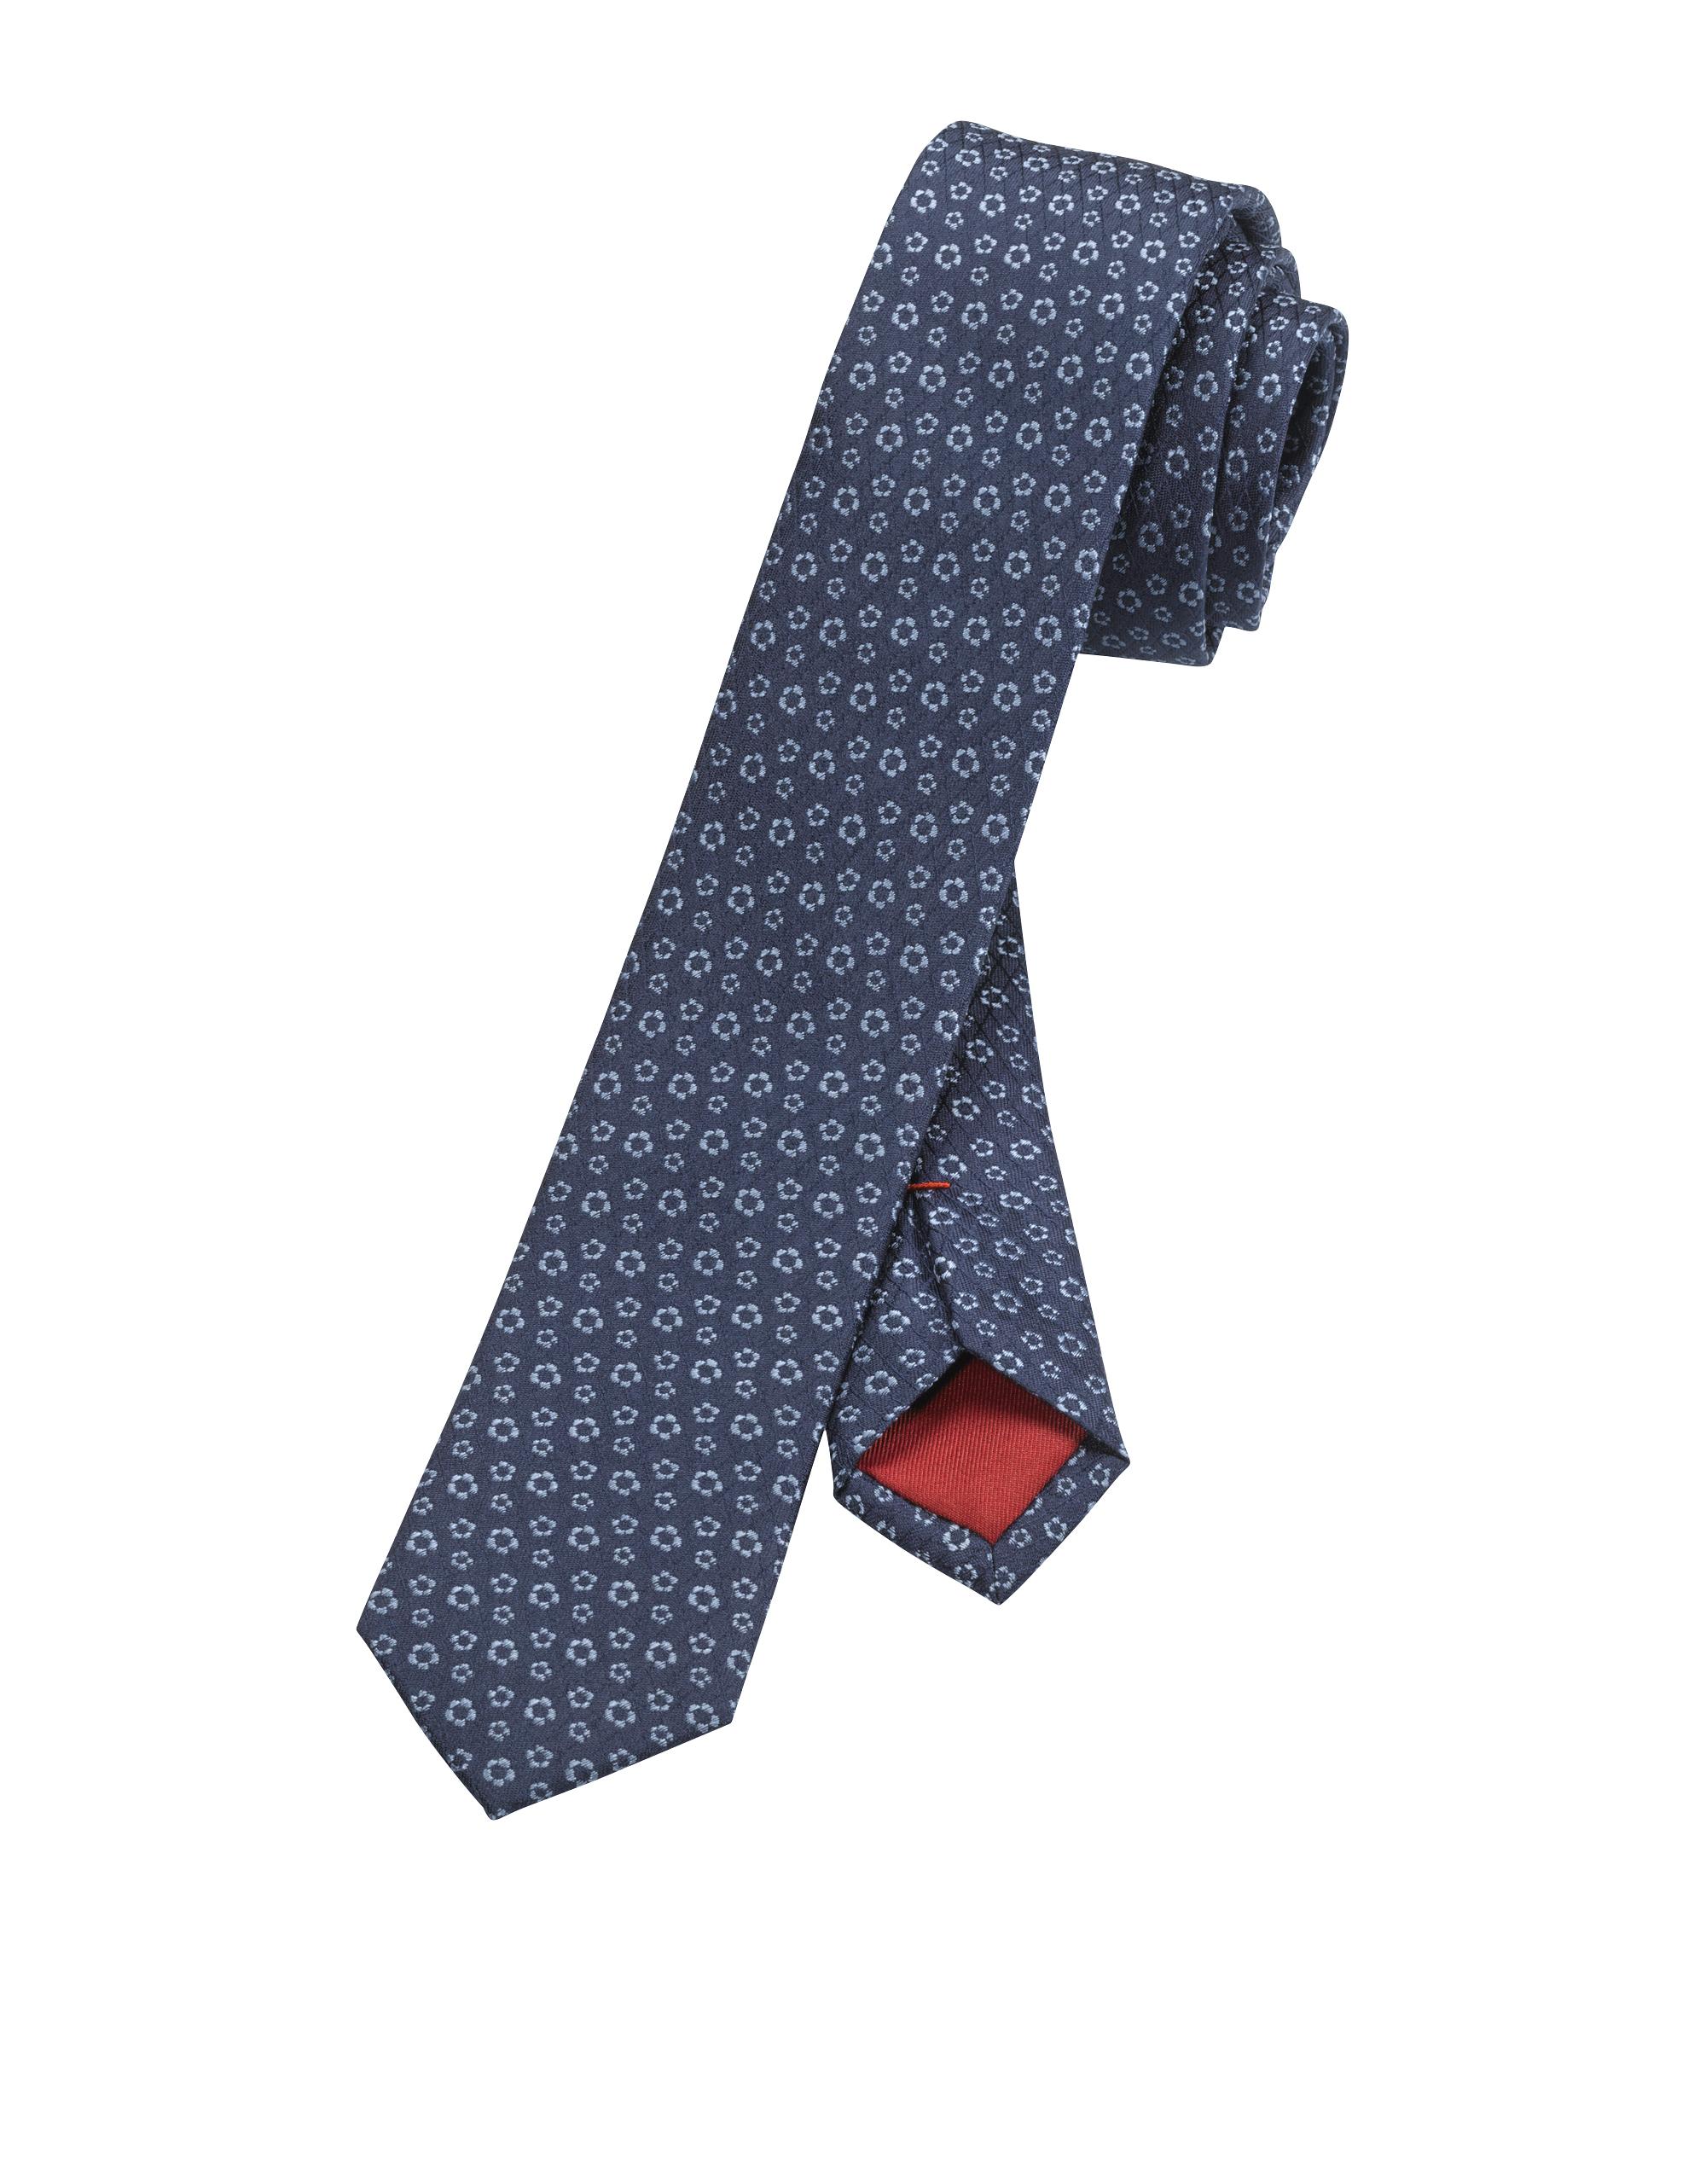 OLYMP Krawatte, Bleu, | Accessoires > Krawatten | Bleu | 100% seide | OLYMP Krawatte